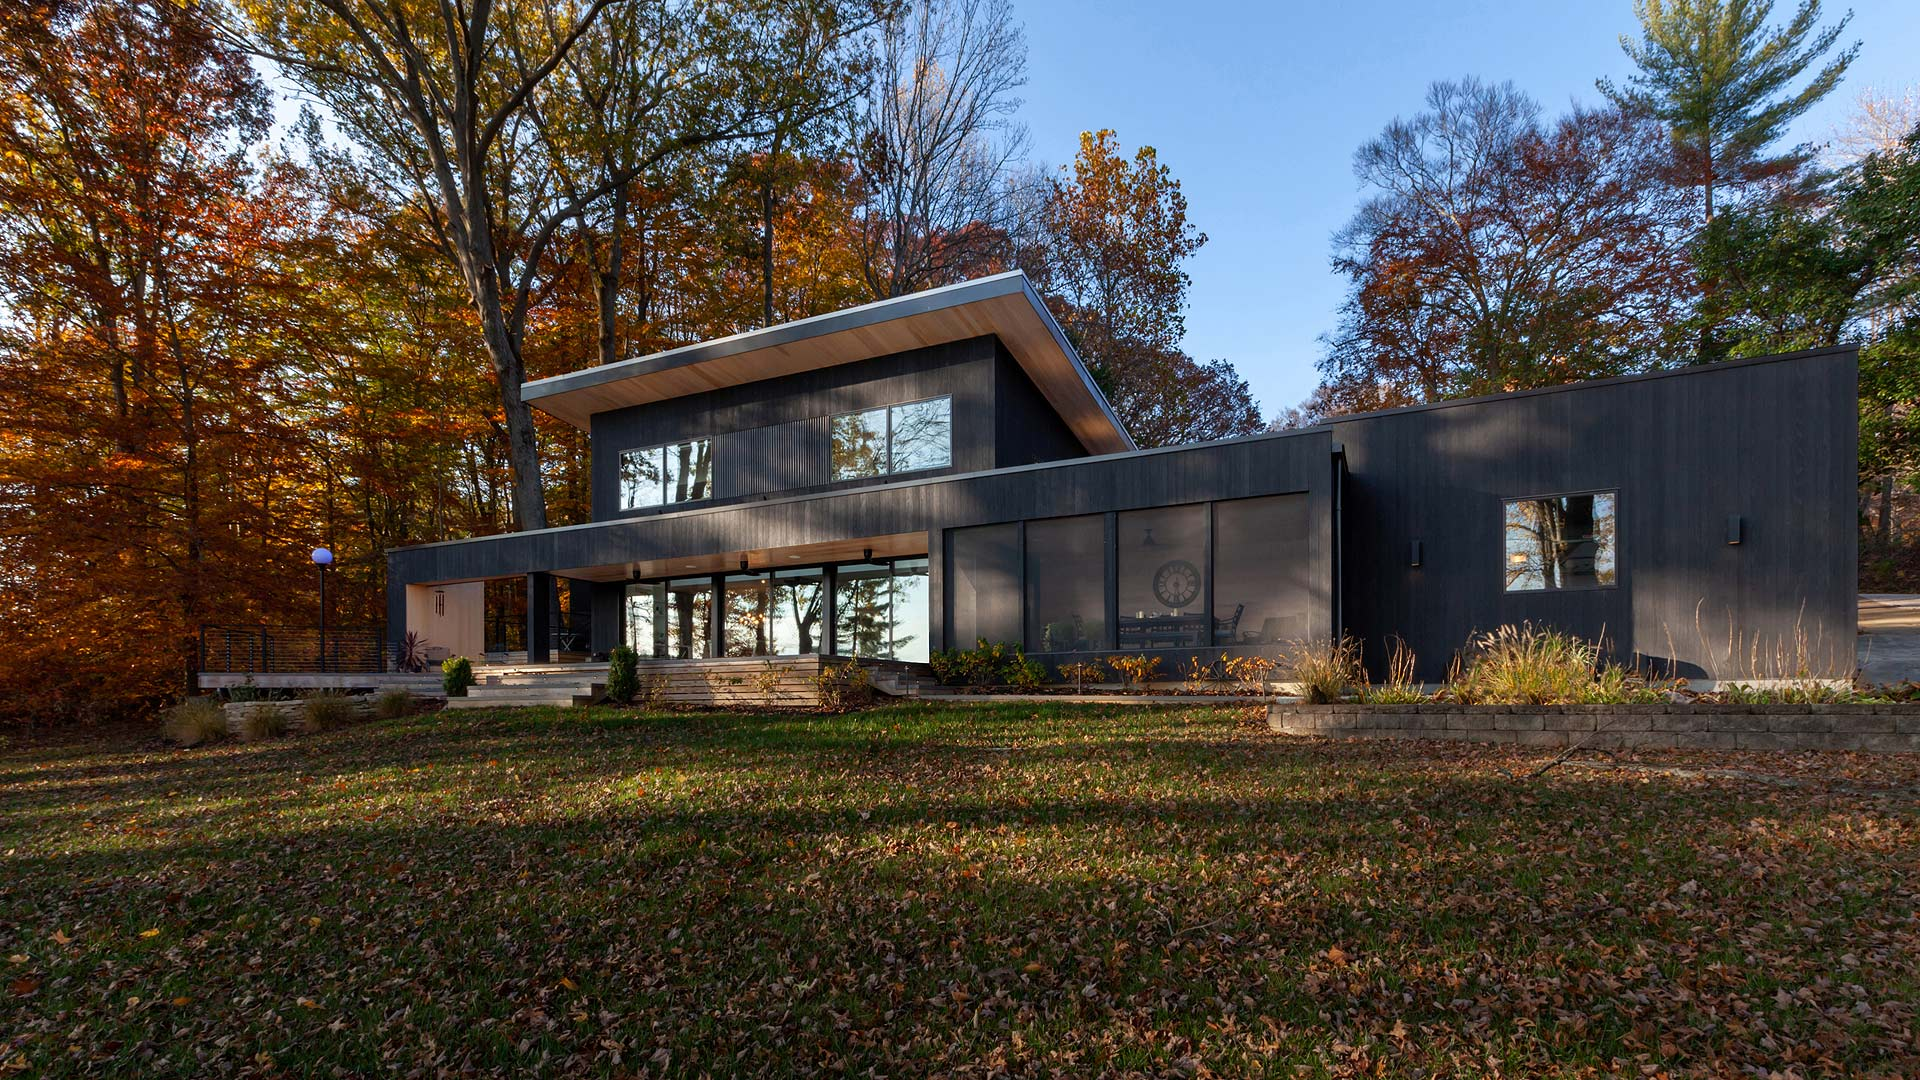 Lakeside Elevation - Lakeside Modern Cottage (H-LODGE) - Unionville, Indiana, Lake Lemon